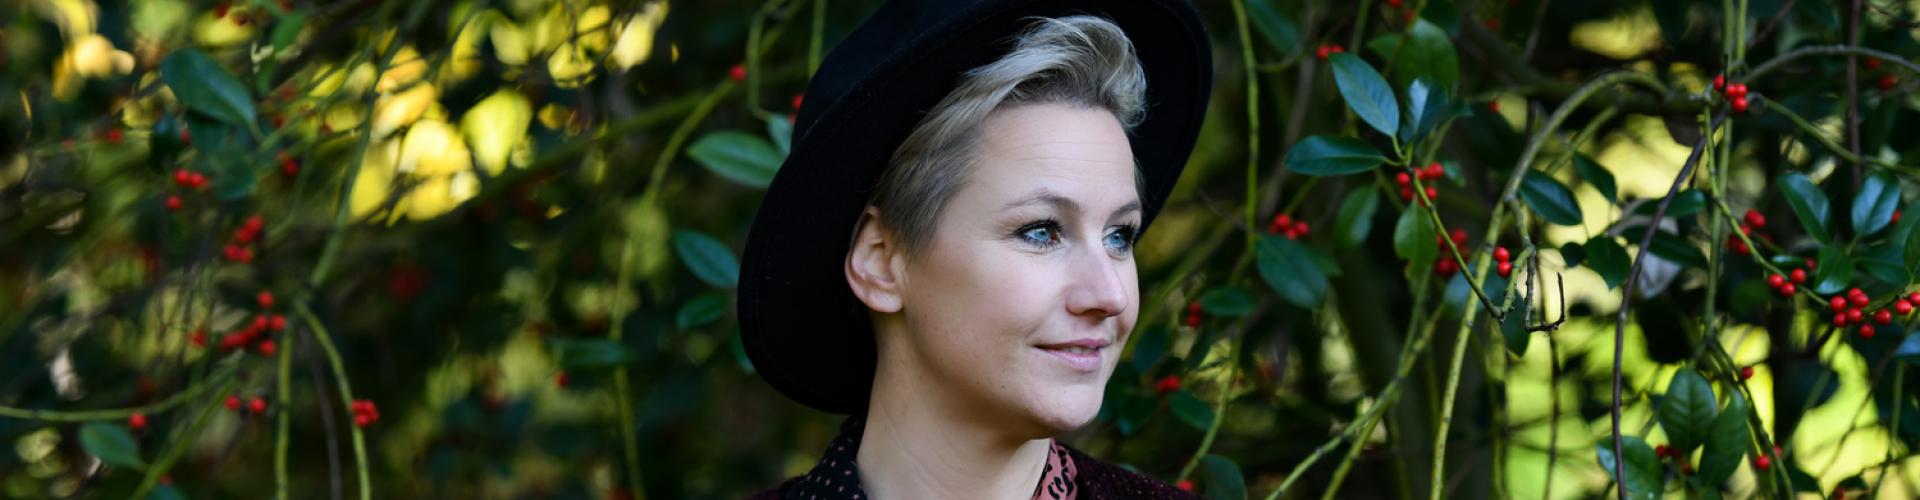 Kim Paffen: Photographer, Content Creator, entrepeneur and Coach